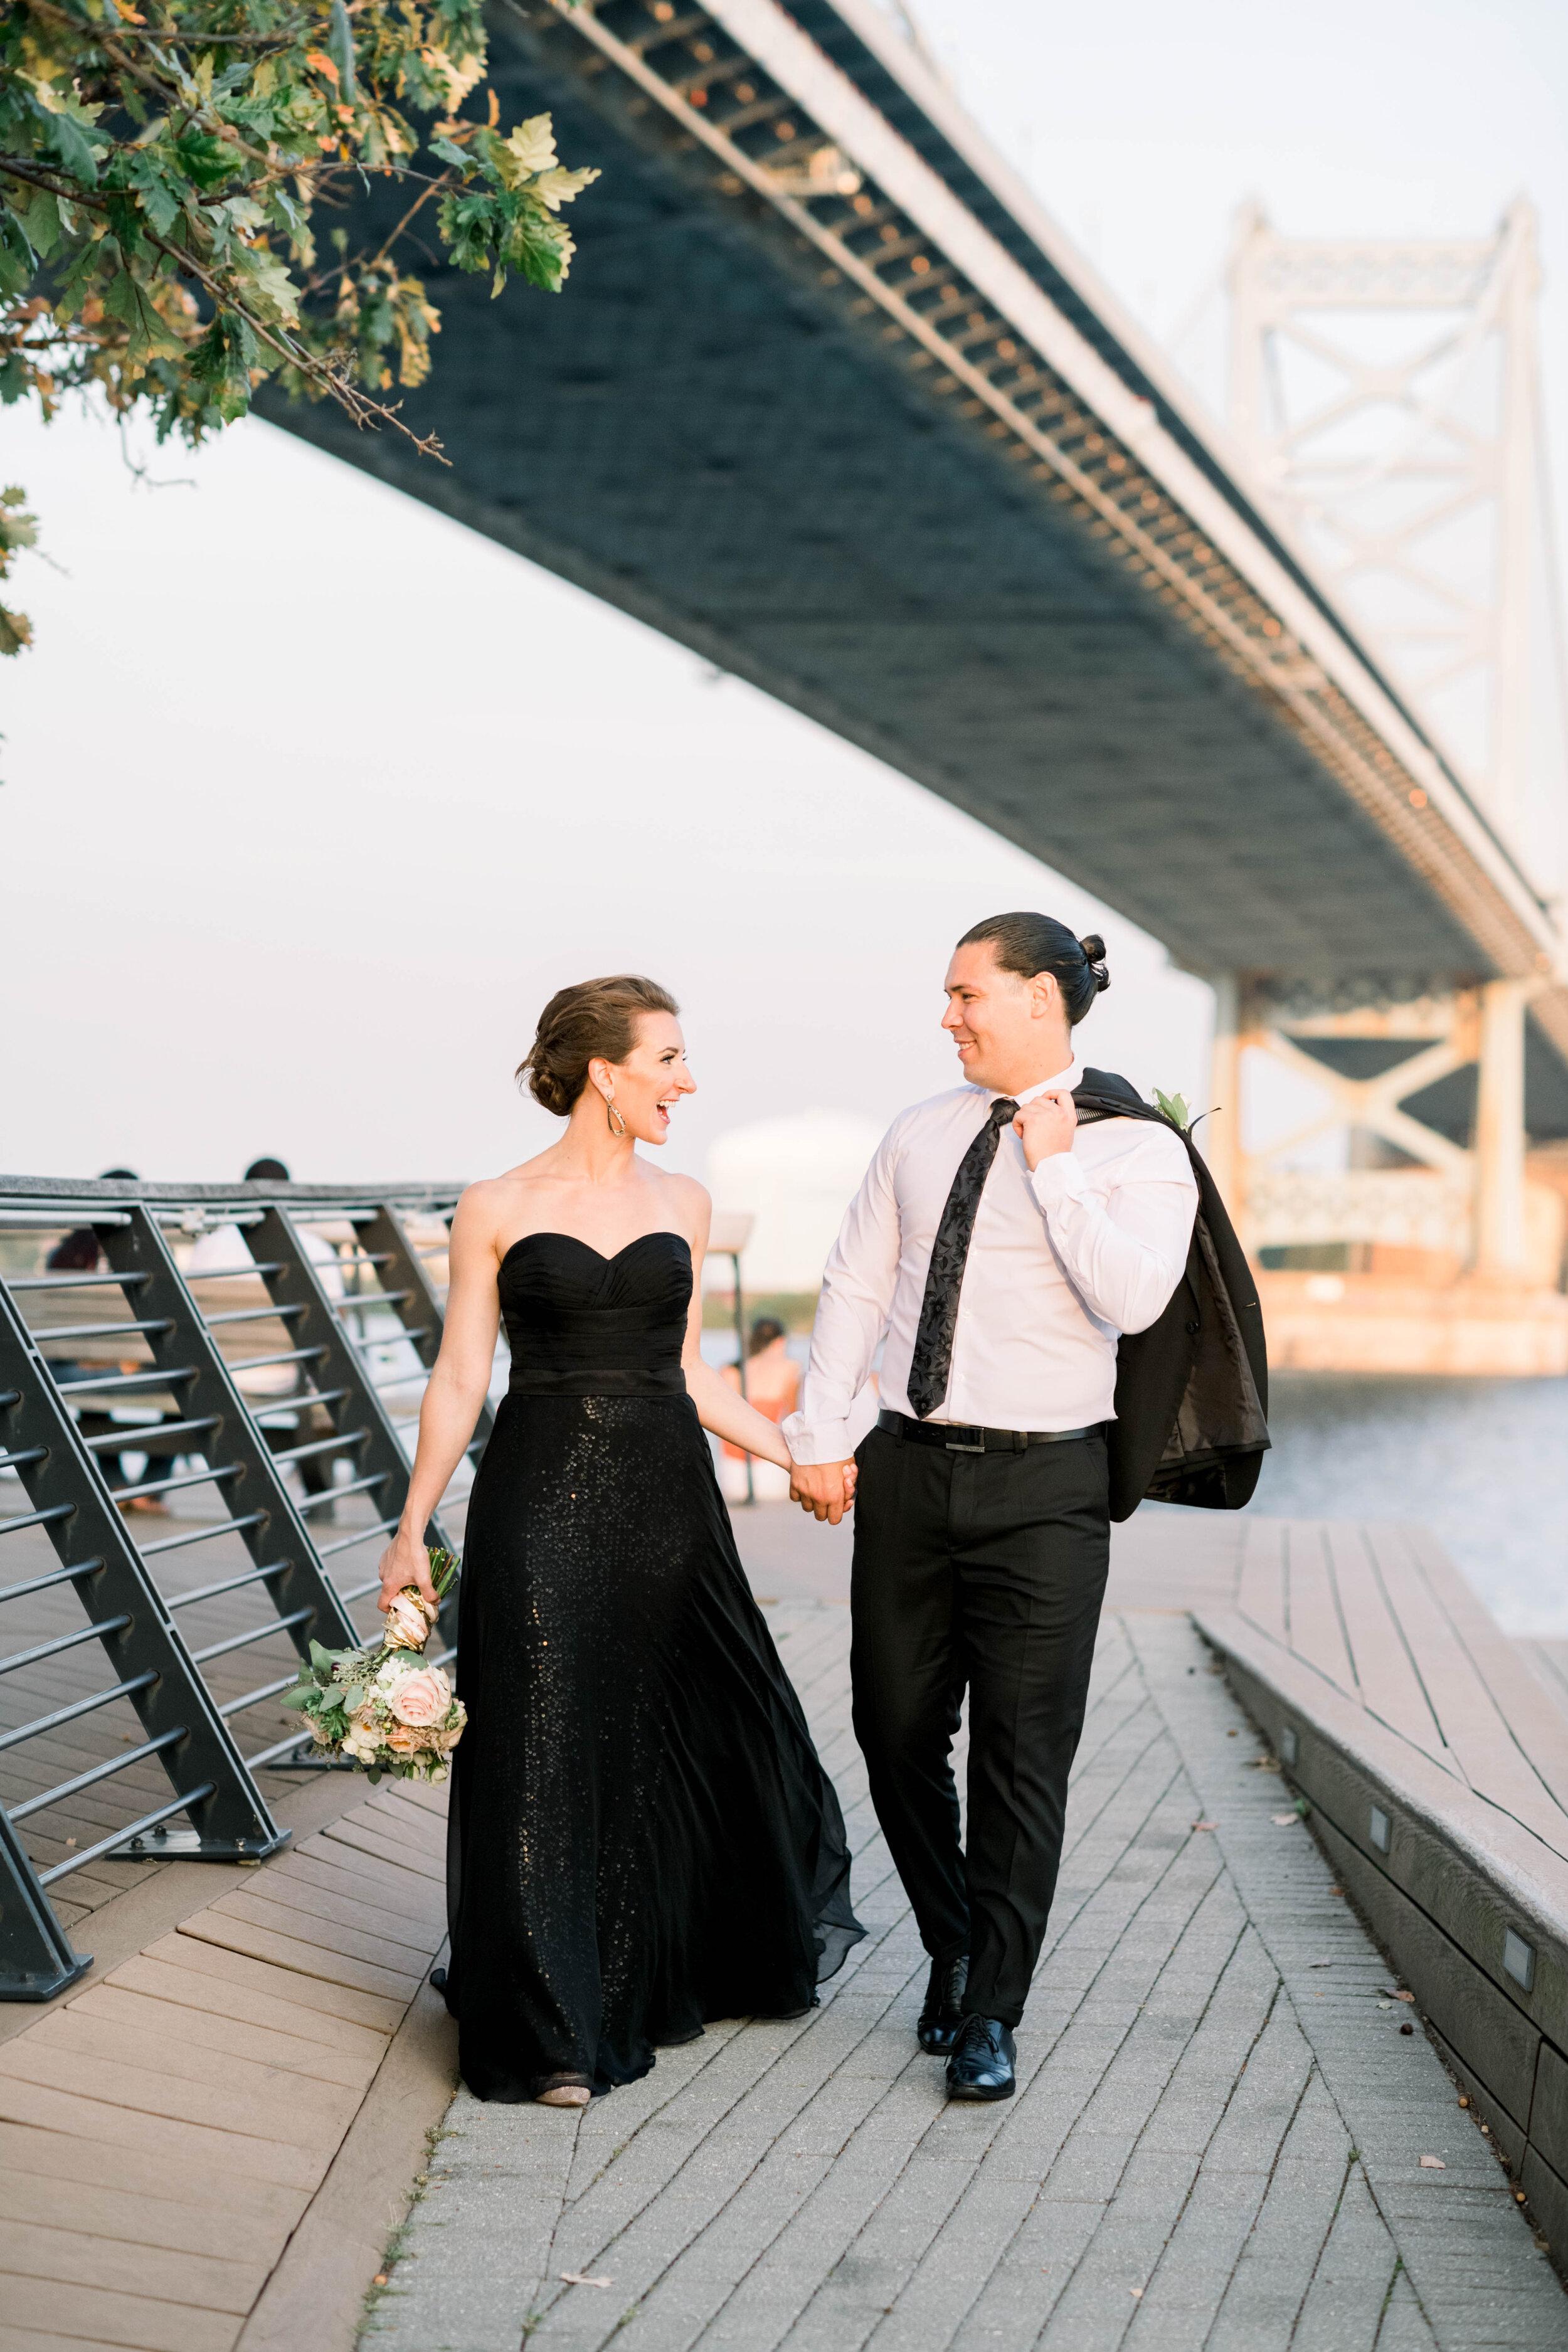 Philadelphia-sunset-engagement-shoot-race street pier-stylish couple-old city Philly-photo